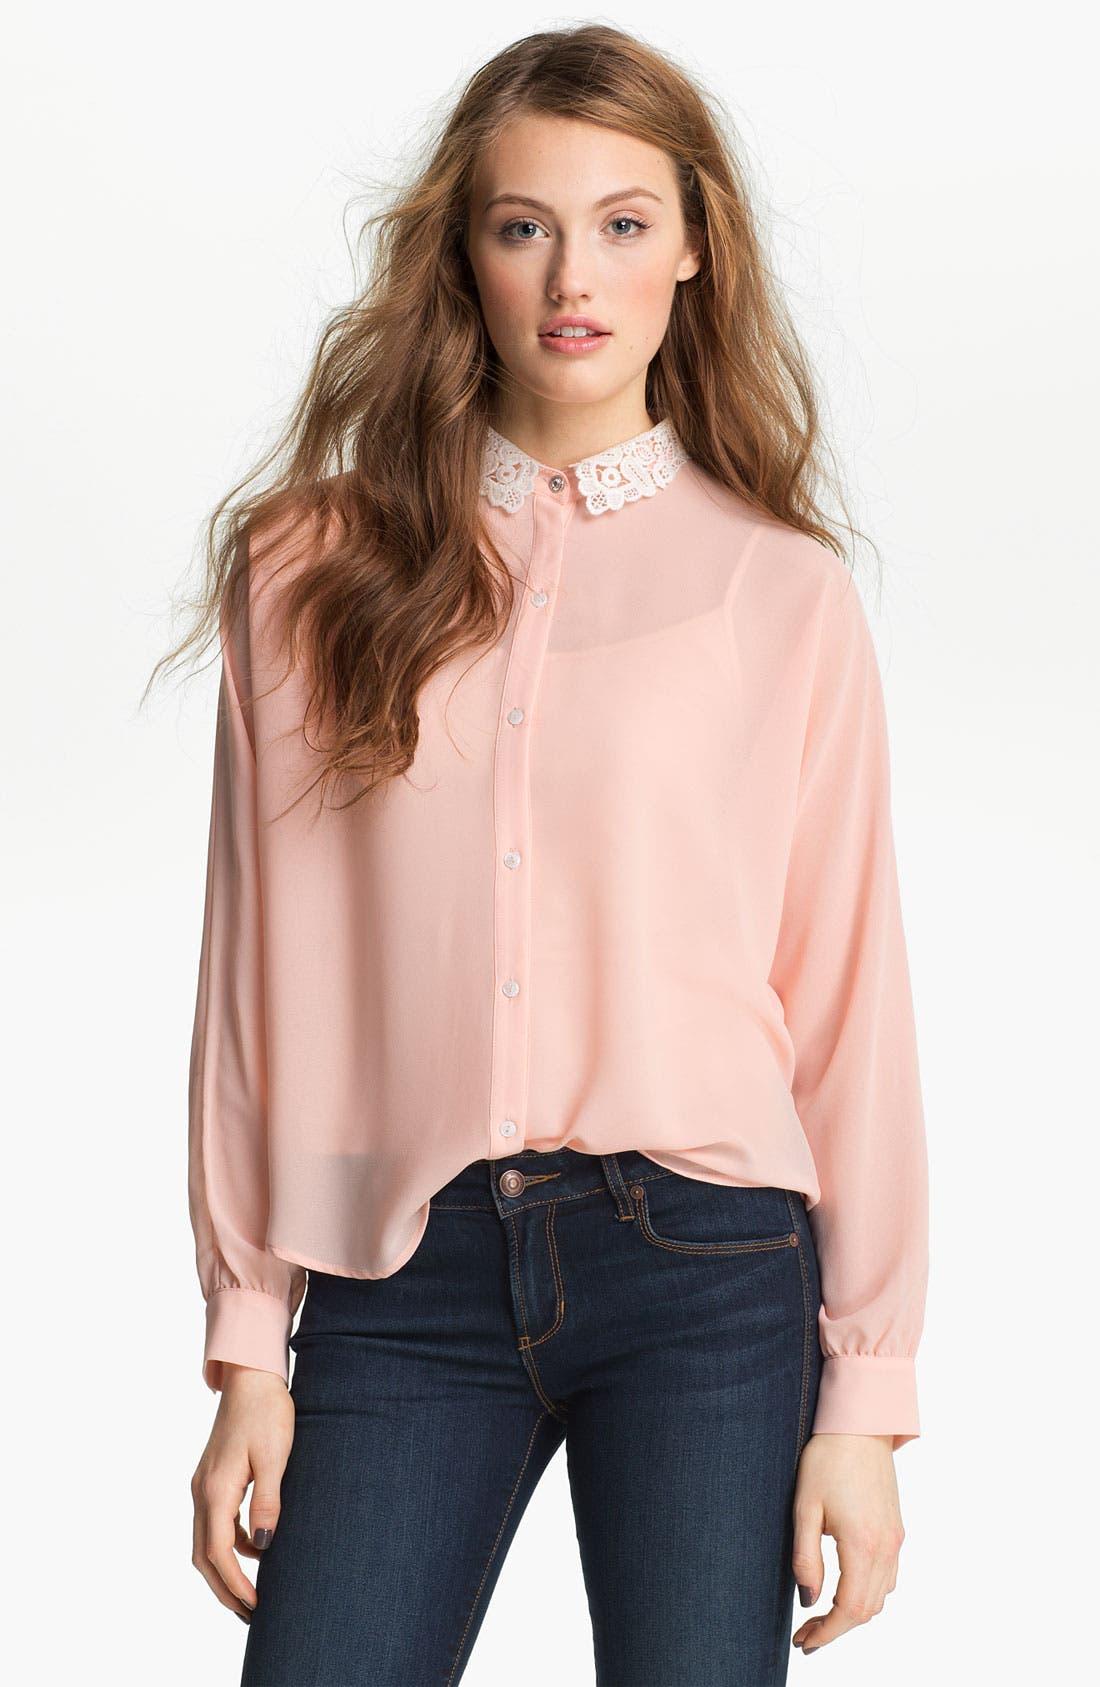 Alternate Image 1 Selected - Elodie Lace Collar Chiffon Shirt (Juniors)